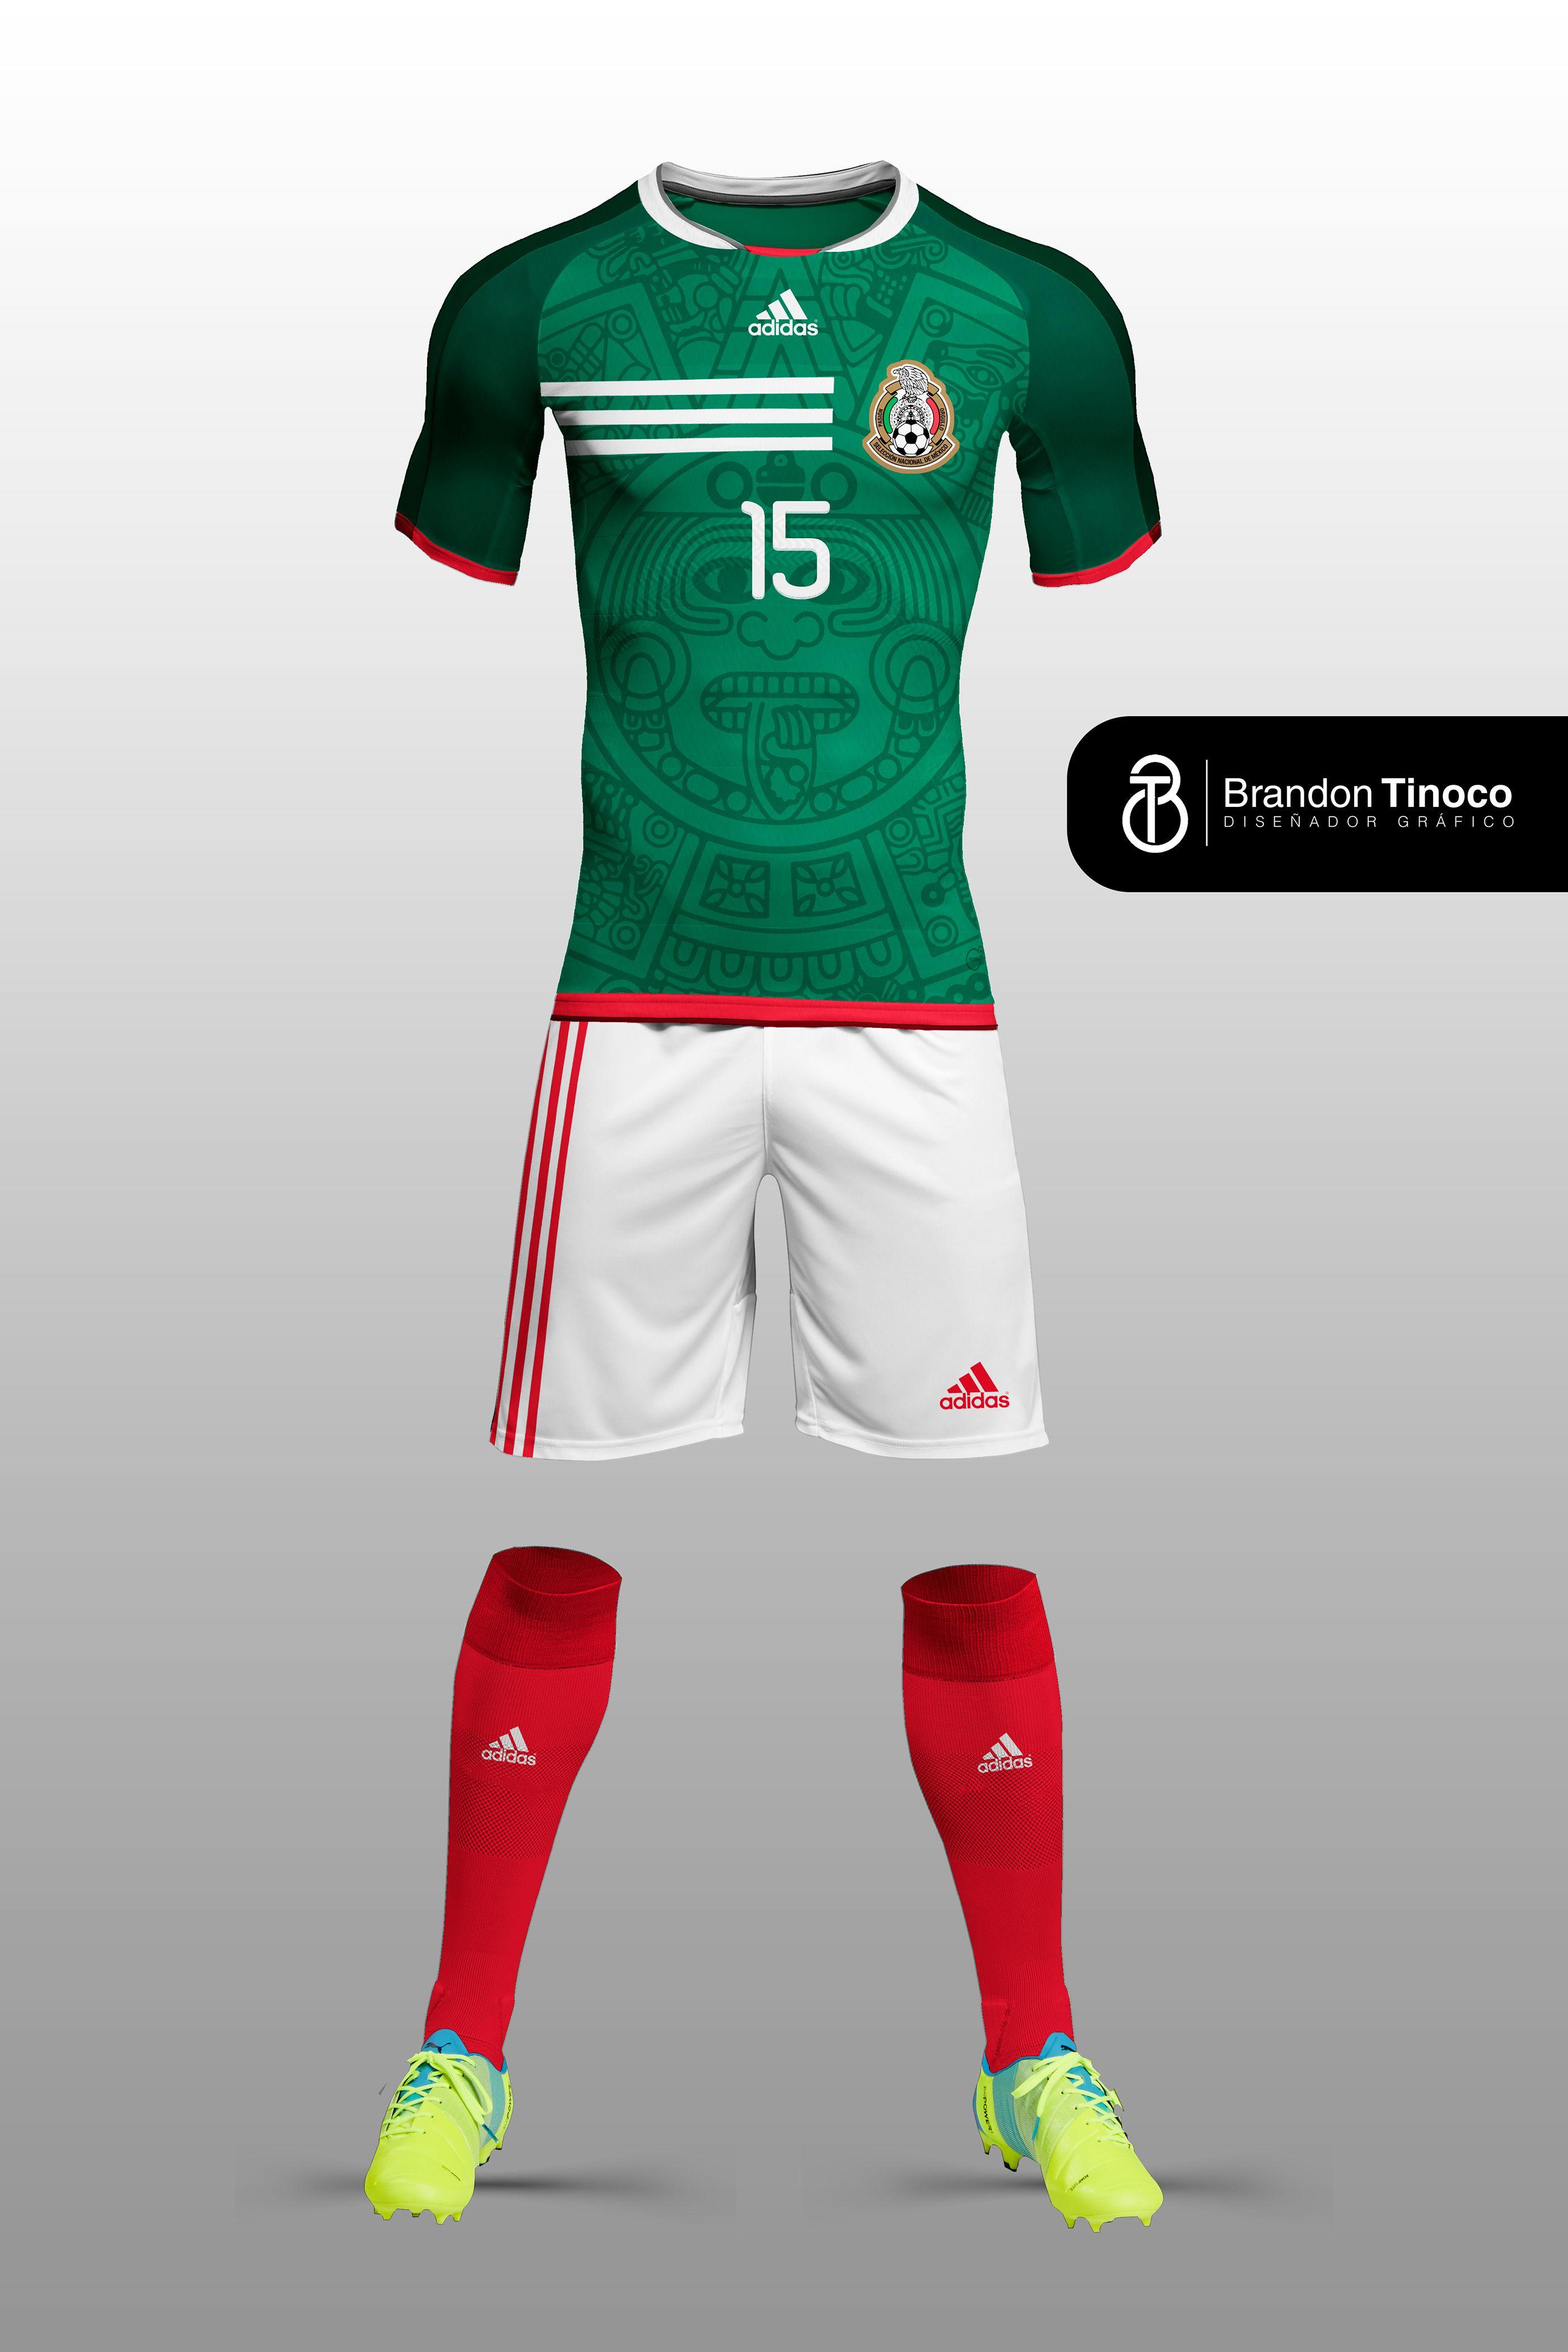 69e0c1a57 Mexico International Soccer Kit (Concept Art) on Behance ...